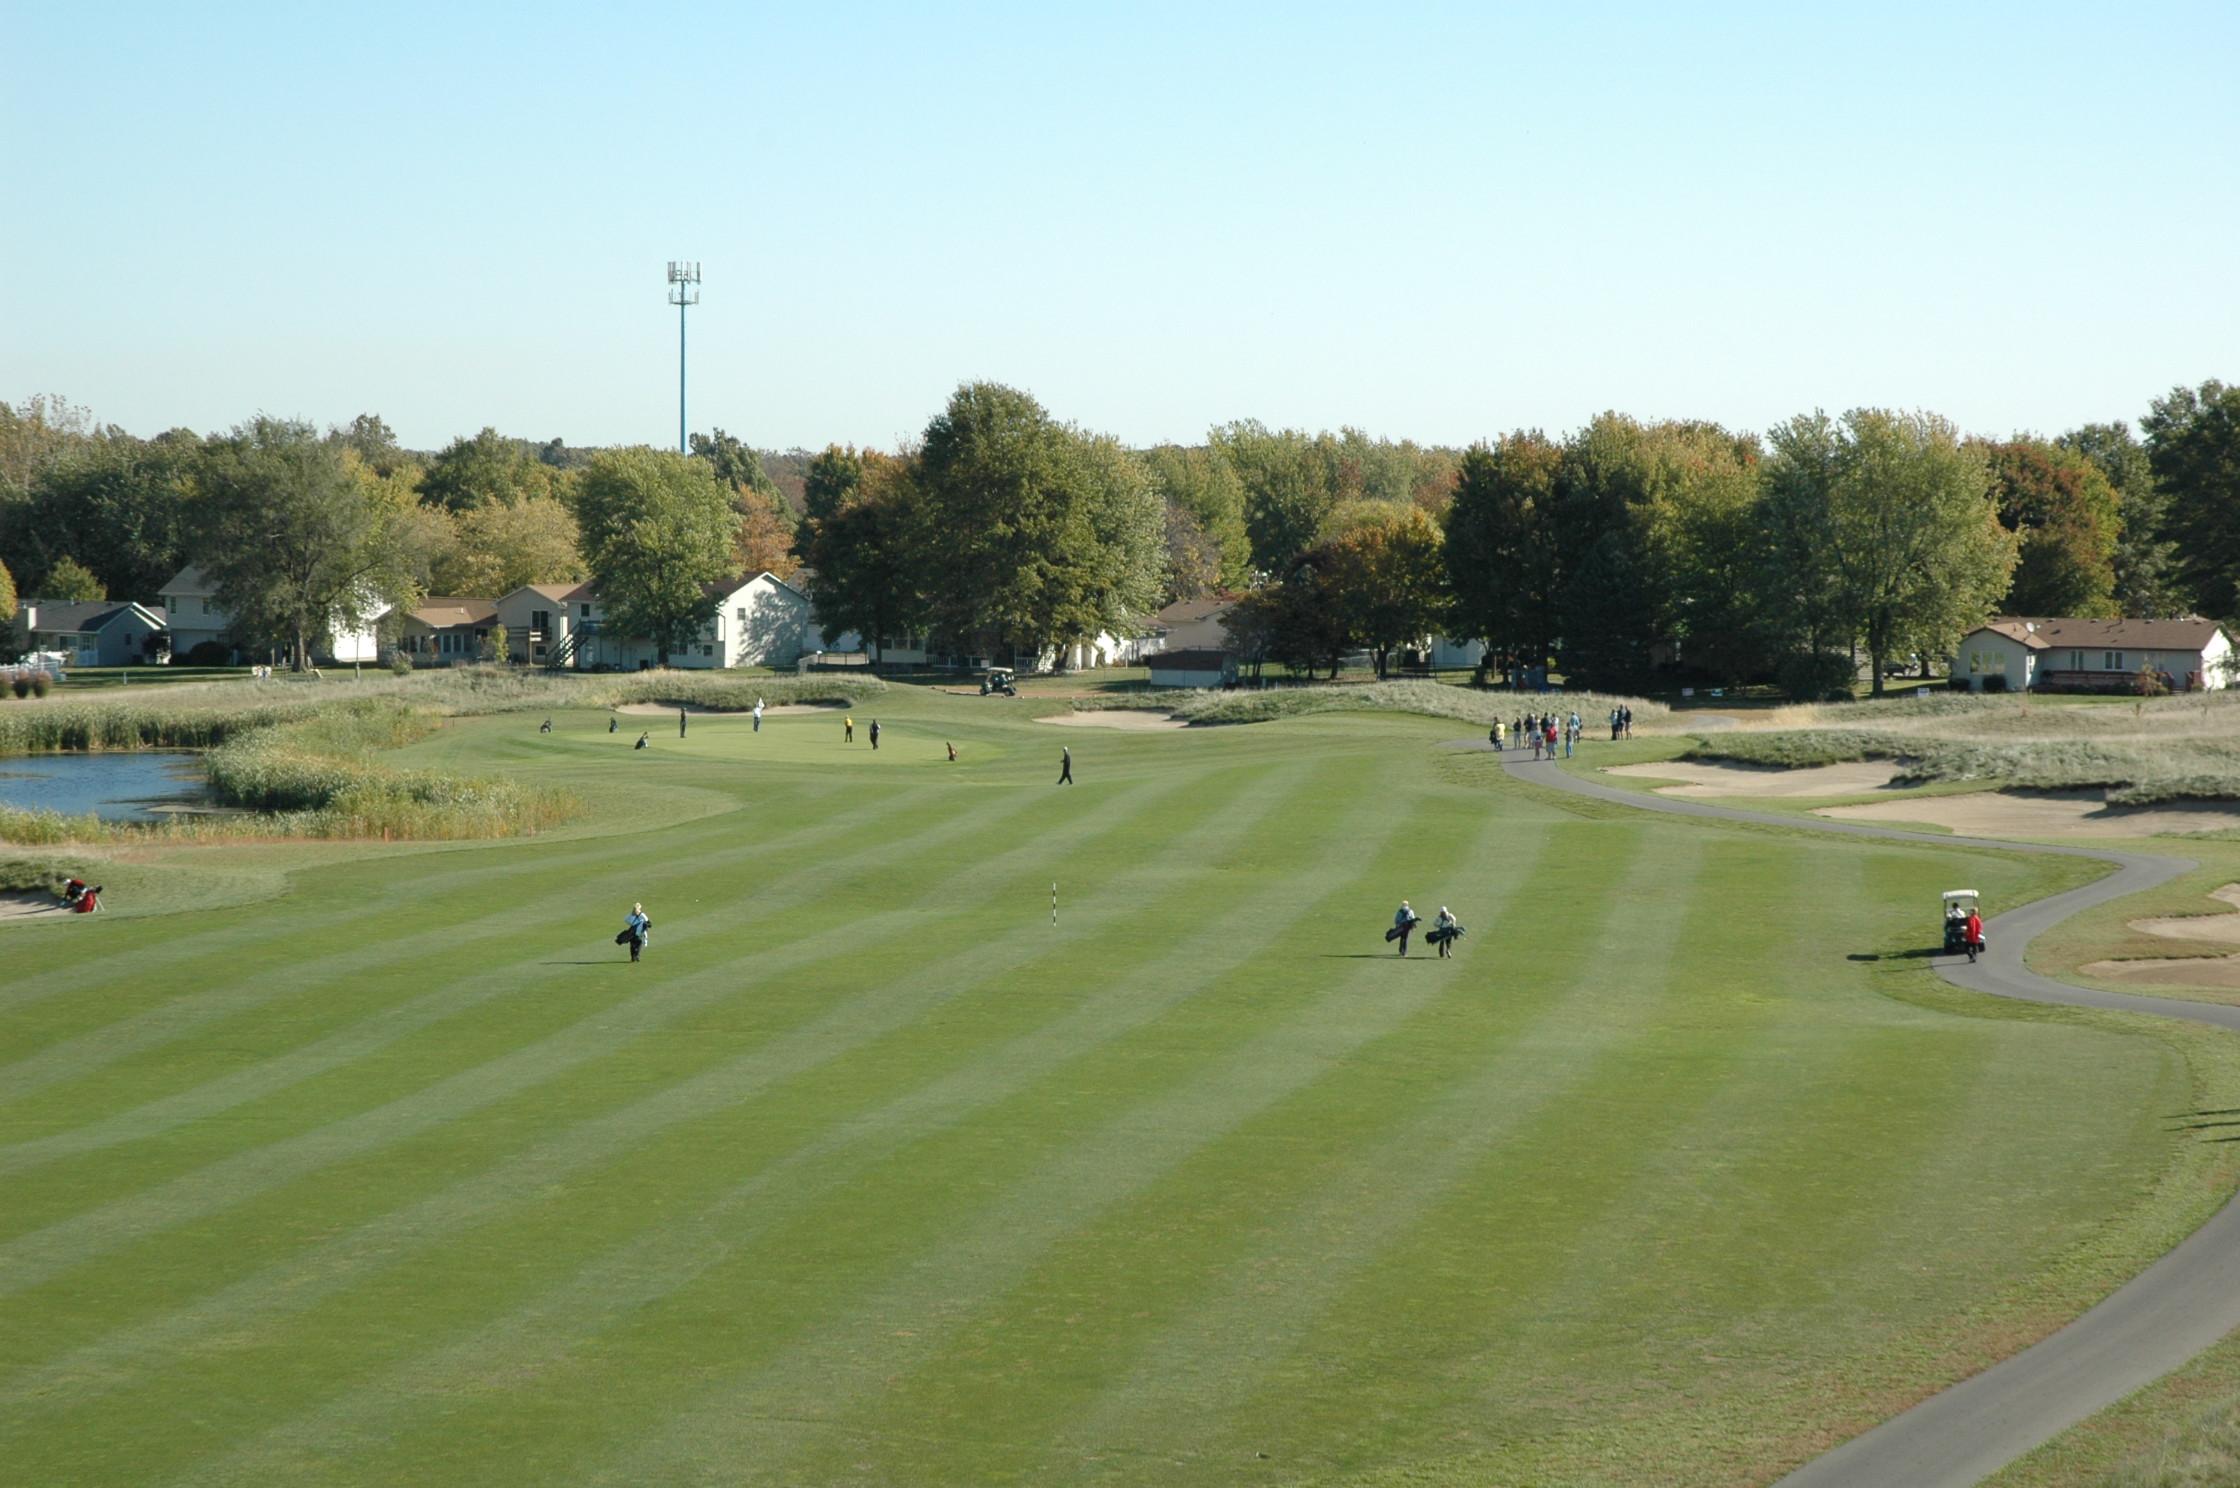 Red Tail Run Golf Club | Enjoy Illinois